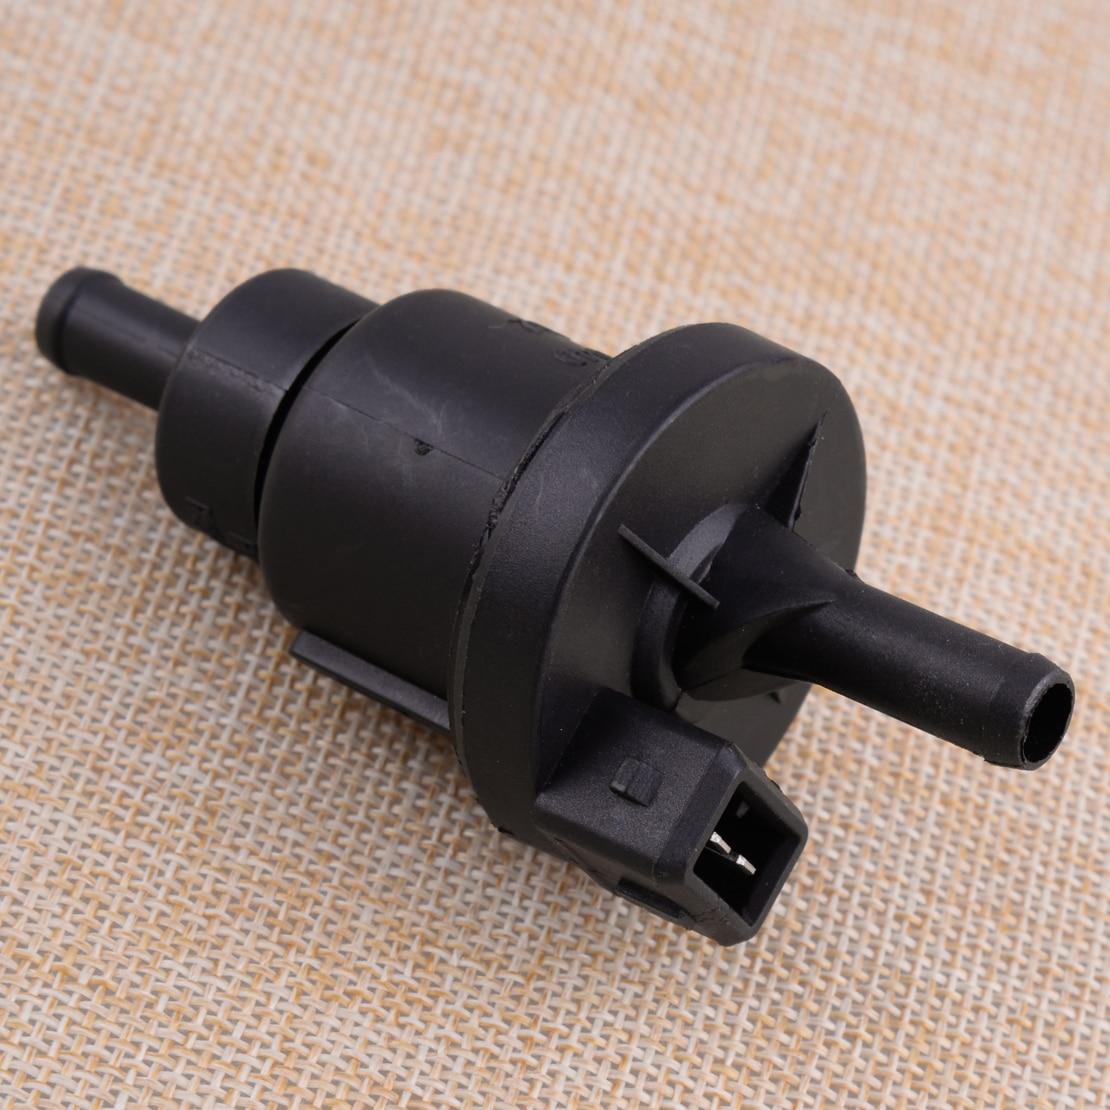 Dwcx coche solenoide bote válvula de purga 28910-22040 2891022040 911-800 para Hyundai Accent Kia Spectra Optima rio sportage